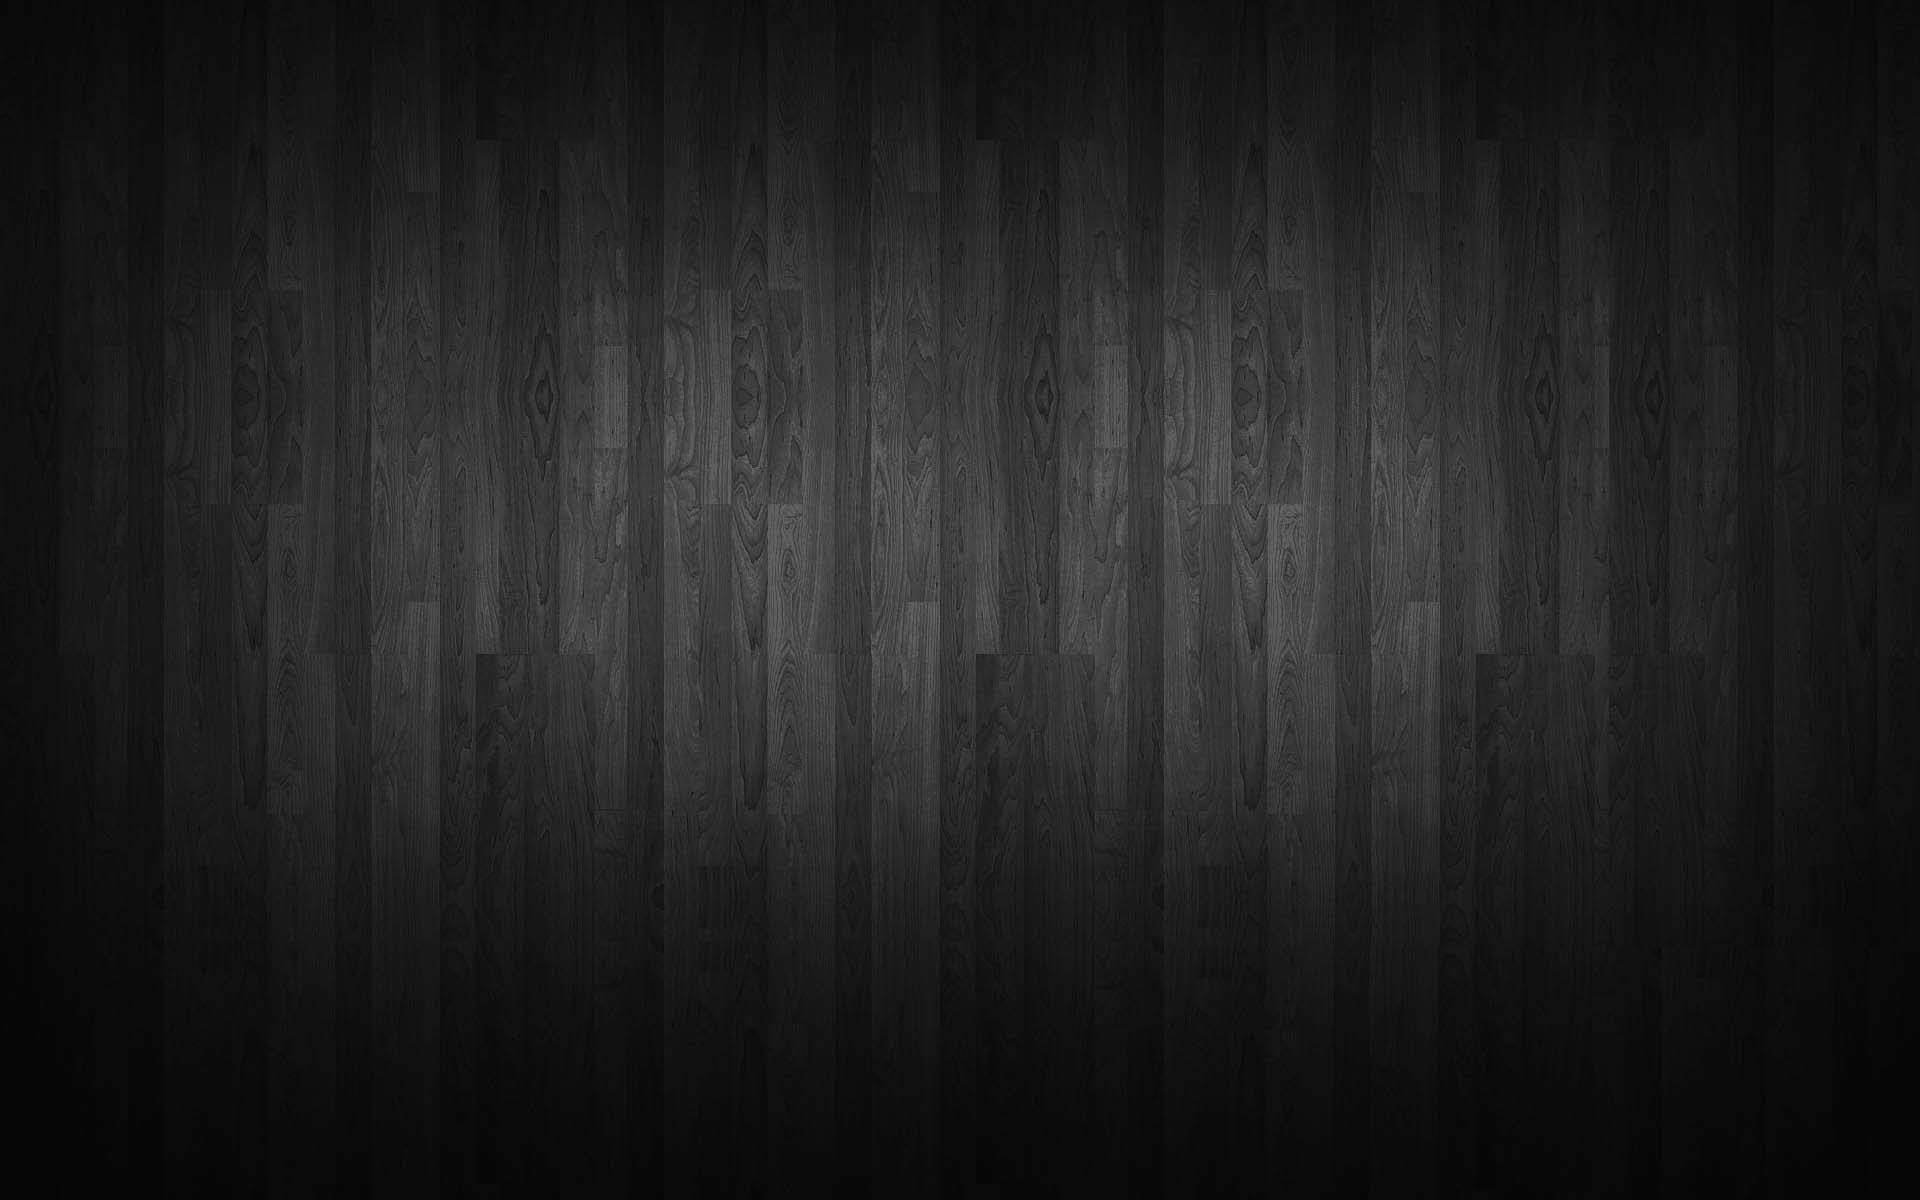 Cool Black Background Designs (47+ images)